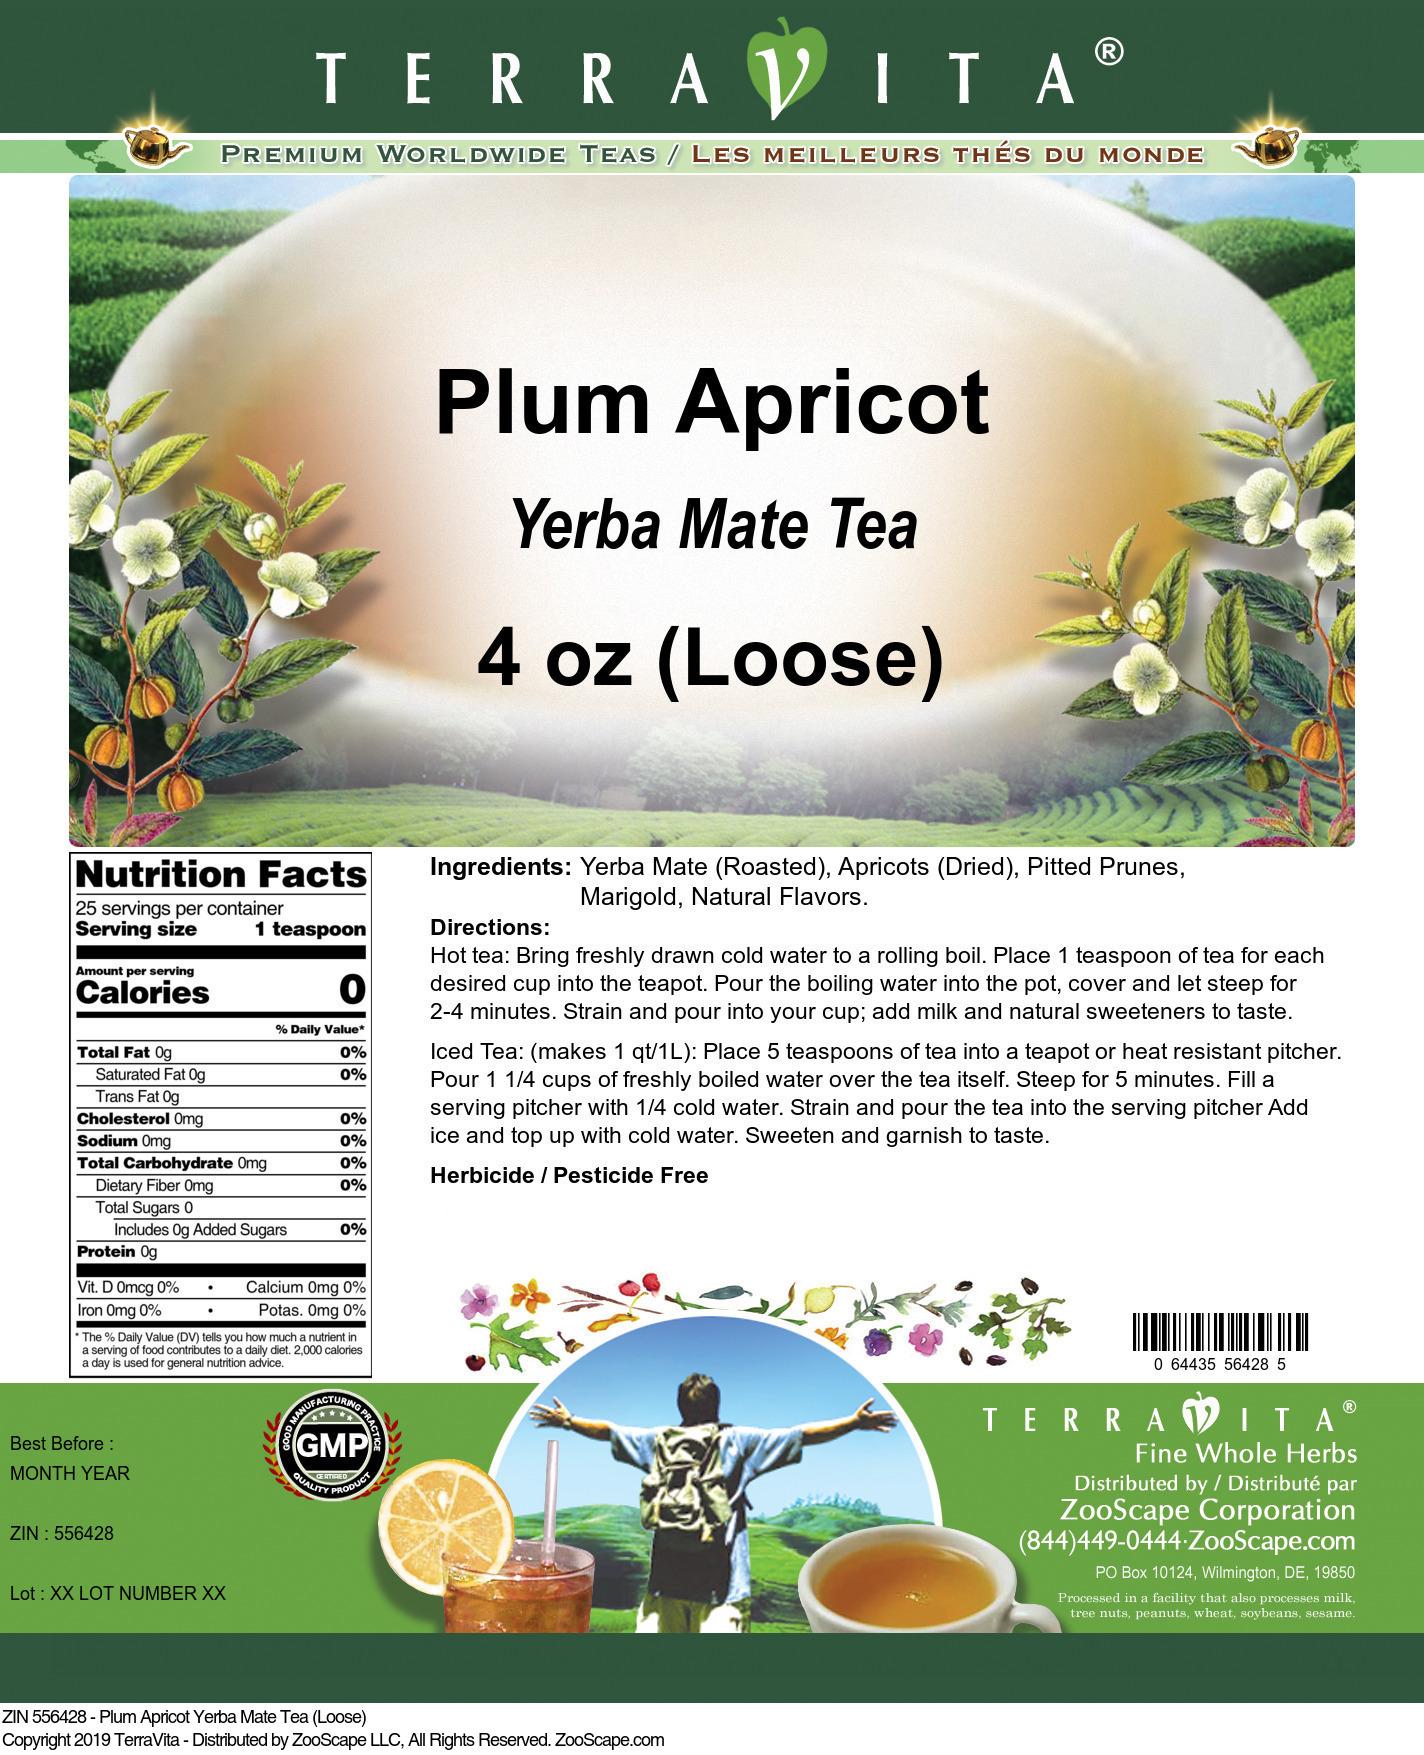 Plum Apricot Yerba Mate